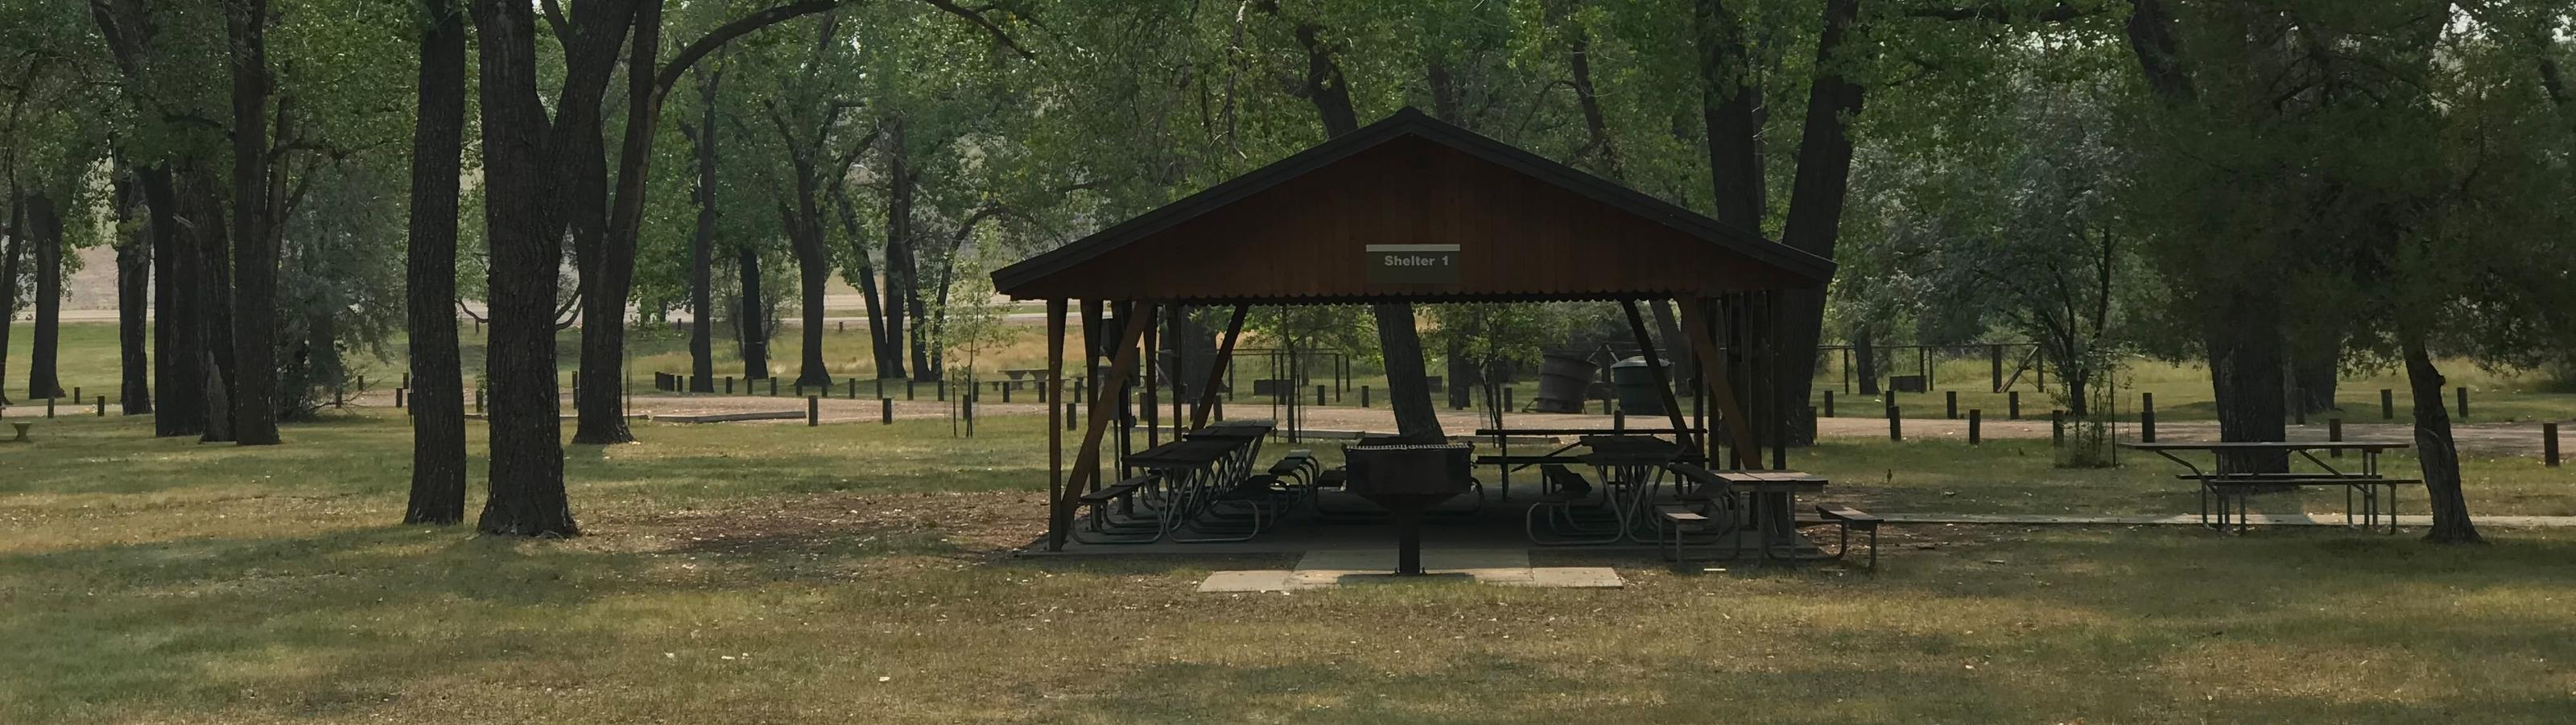 Kiwanis Shelter 1